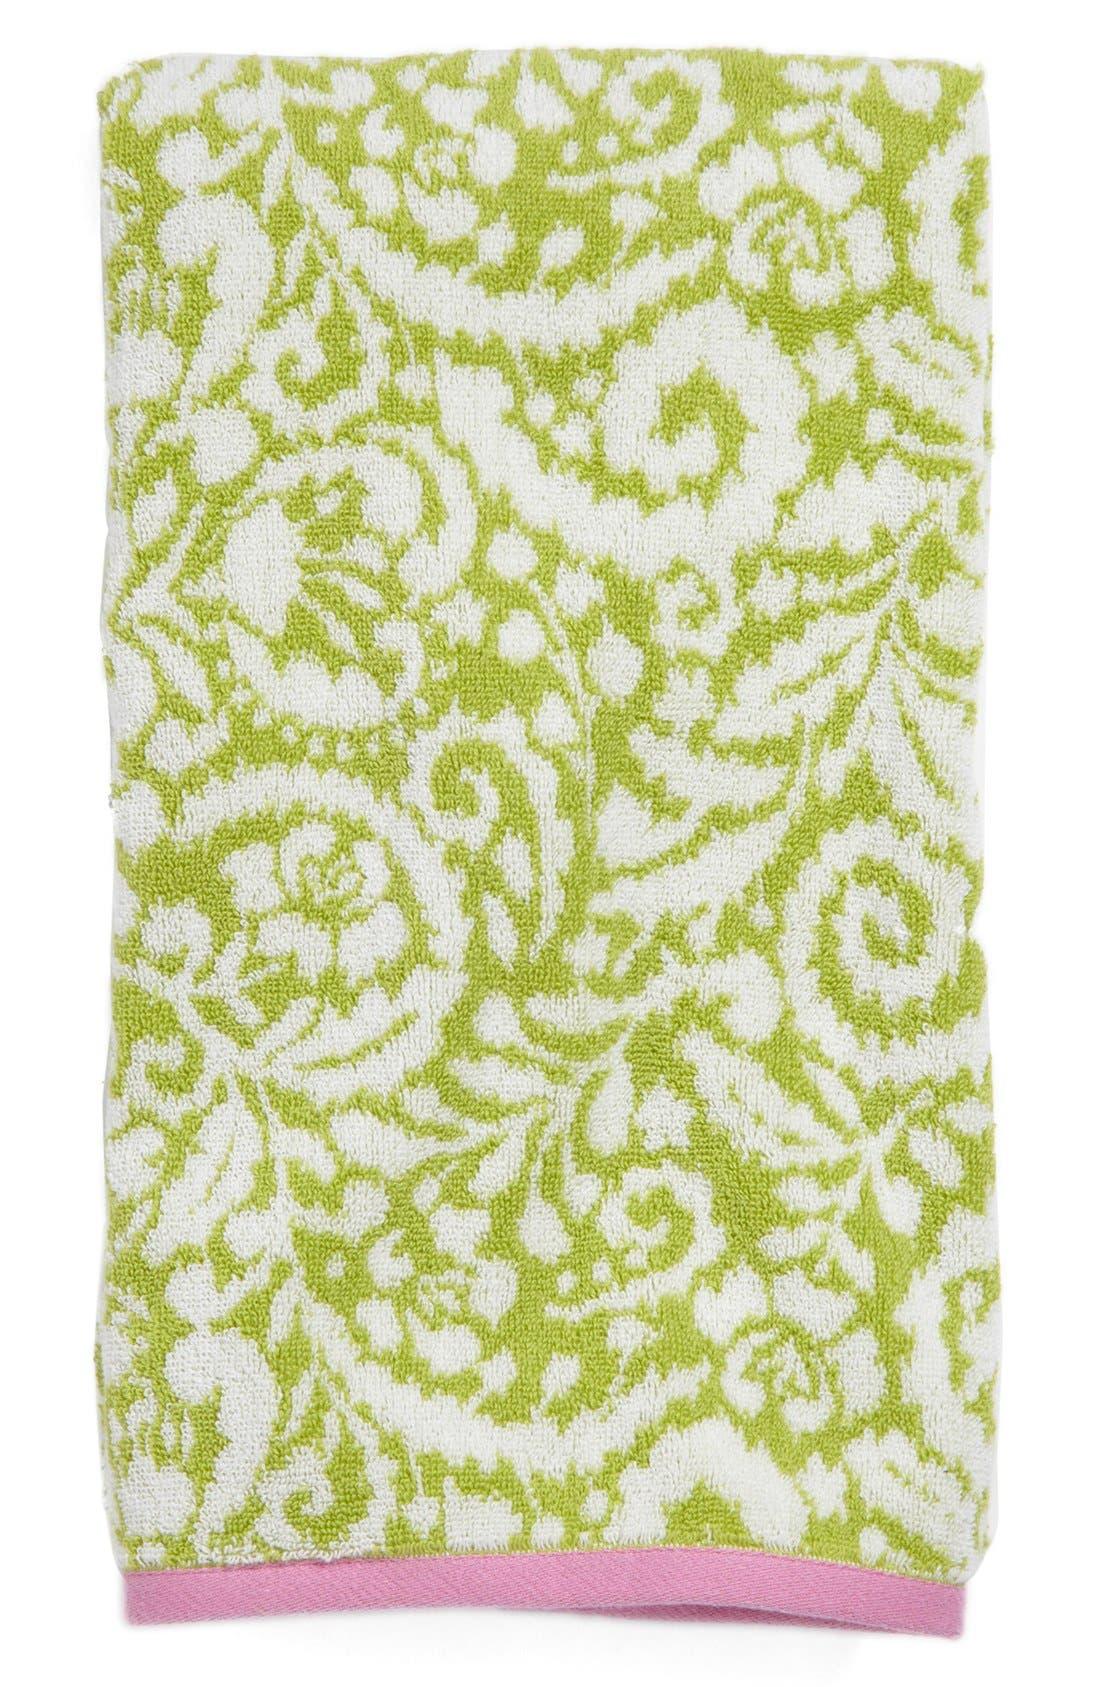 'Ikat' Jacquard Bath Towel,                             Main thumbnail 1, color,                             Mlt